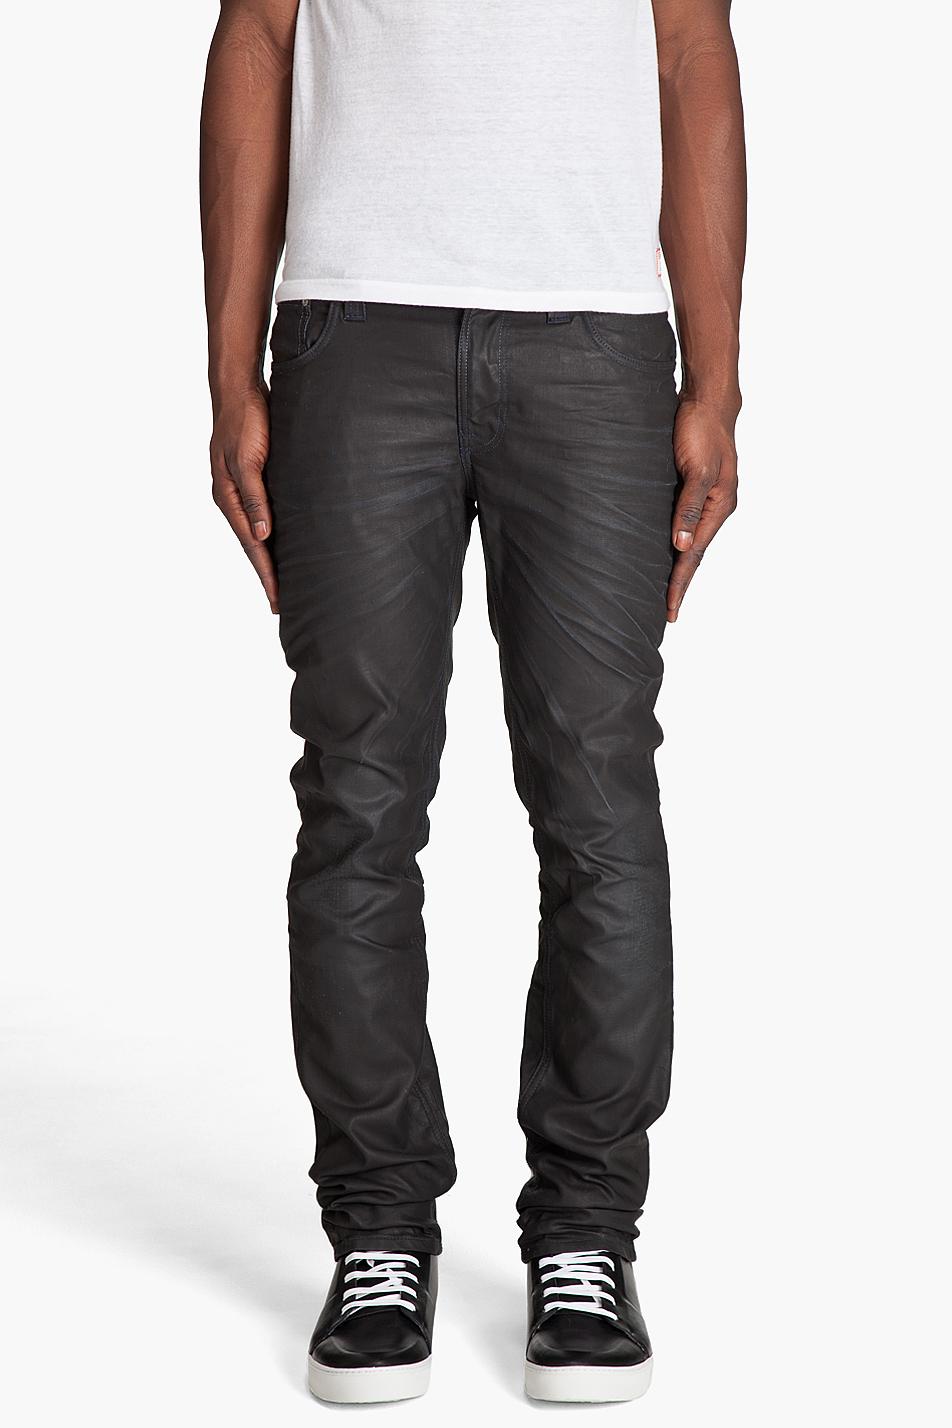 nudie jeans thin finn black coated jeans in black for men. Black Bedroom Furniture Sets. Home Design Ideas